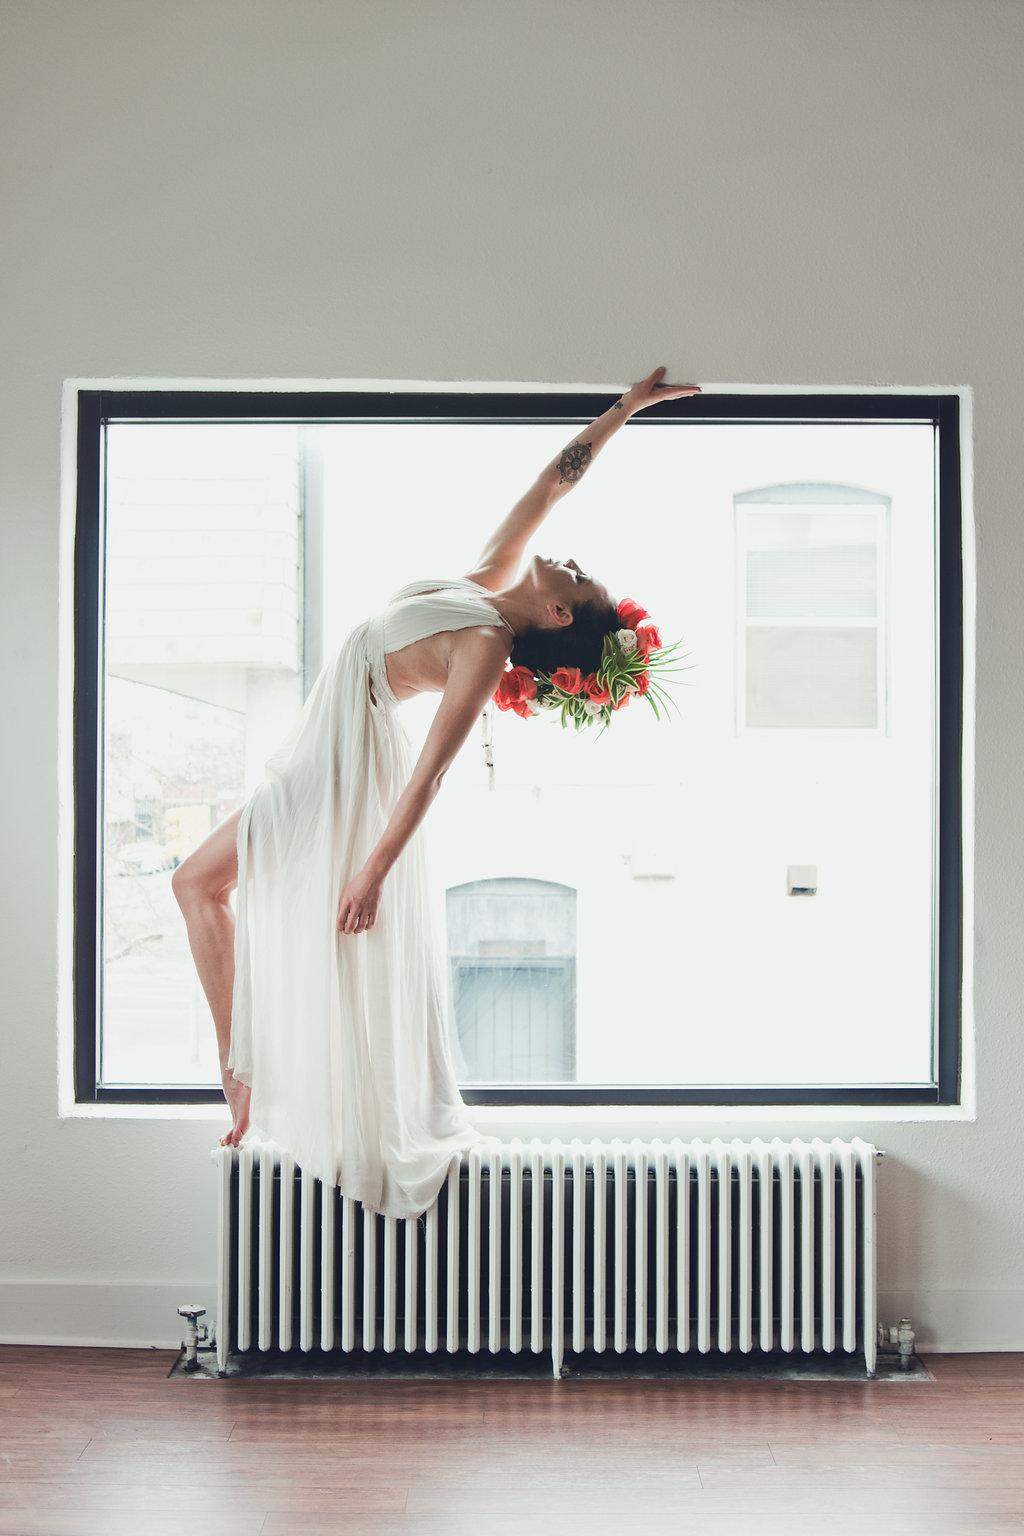 Lisa Rundall Wedding Photography Colorado model balancing on wall heater